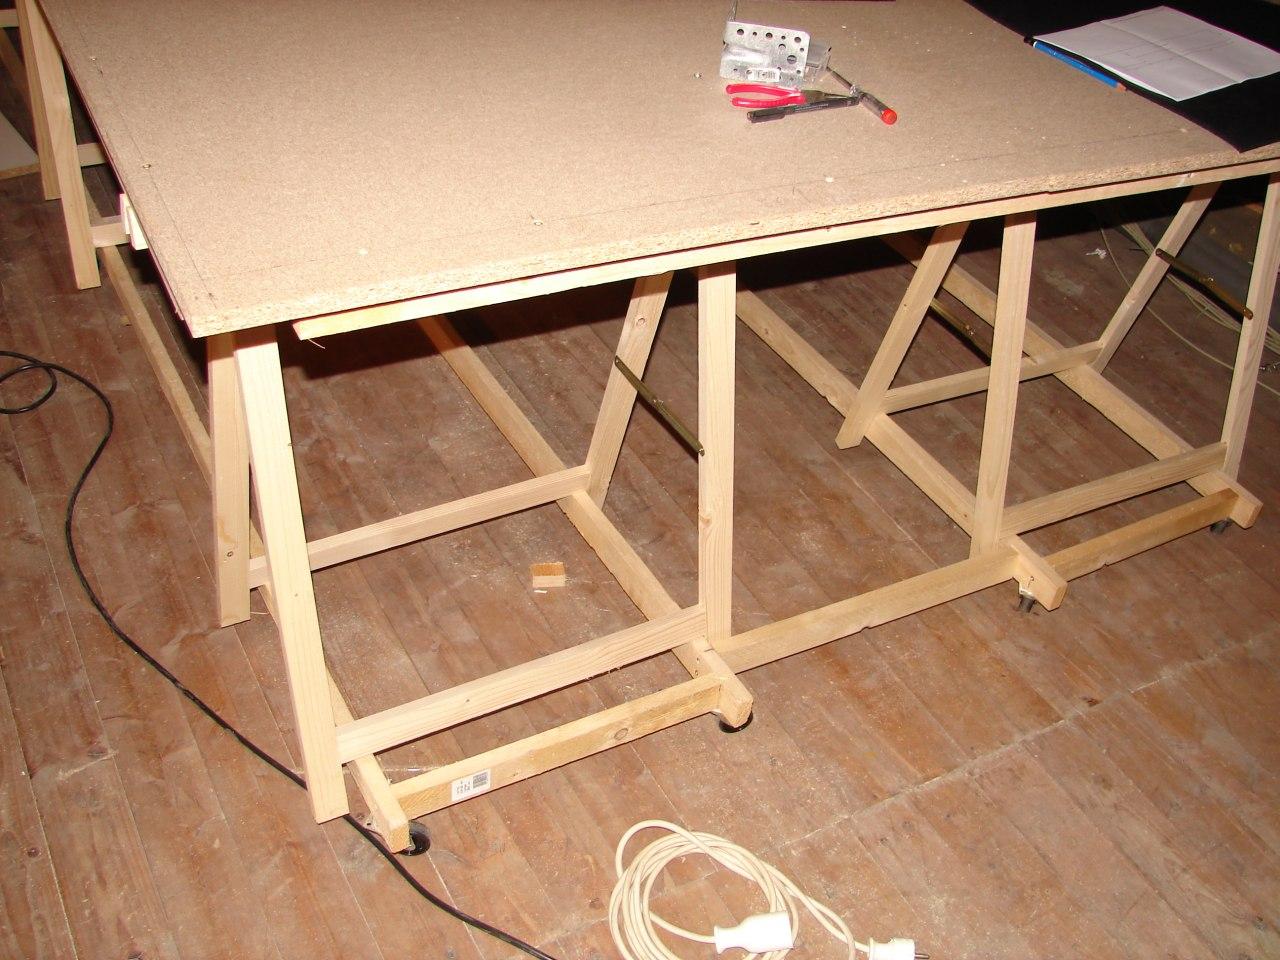 rohbau unterbau. Black Bedroom Furniture Sets. Home Design Ideas